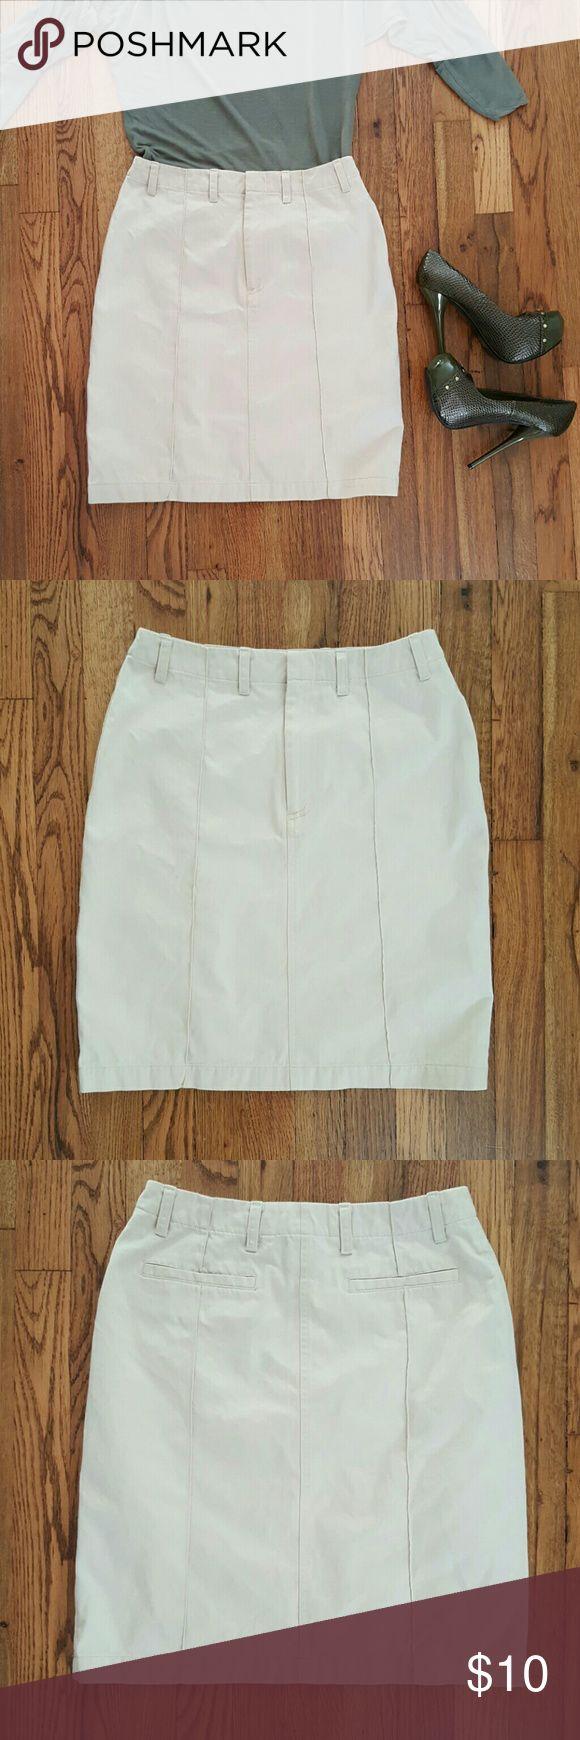 "BANANA REPUBLIC Beige Pencil skirt Straight. Knee length. 2 back pockets. 100% cotton.  Seaming details at front & back.   Waist 14"" Length 20"" Banana Republic Skirts"